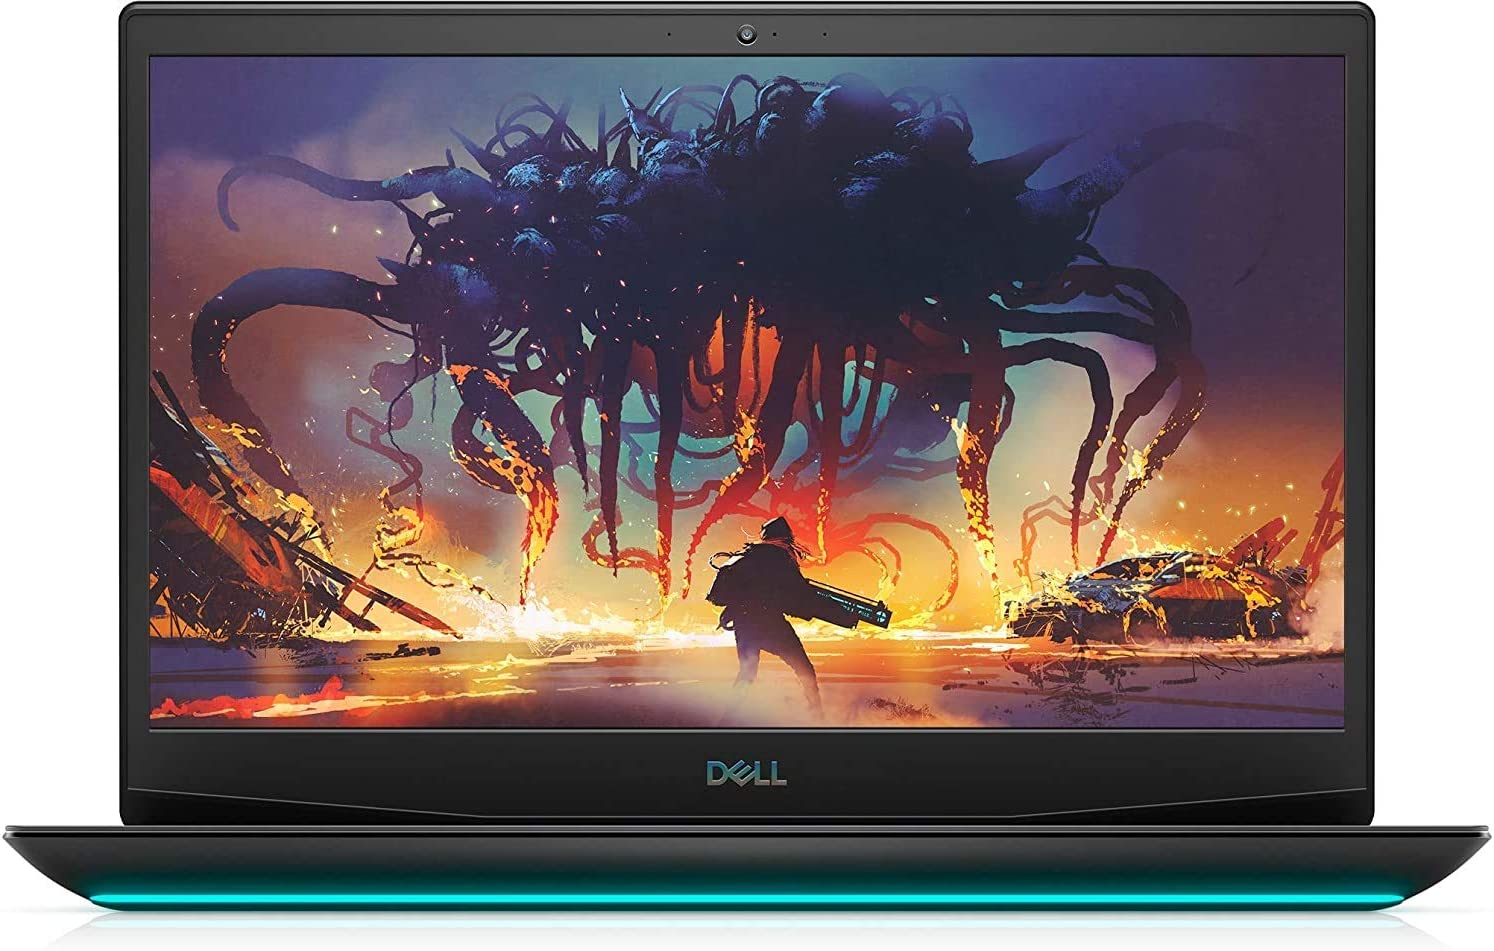 2020 Newest Dell G5 15.6'' FHD Gaming Laptop, Intel i7-10750H, NVIDIA GTX 1650Ti, 16GB DDR4 RAM, 512GB PCIe Solid State Drive, HDMI, WiFi, Backlit Keyboard Windows 10 | 32GB Tela USB Card